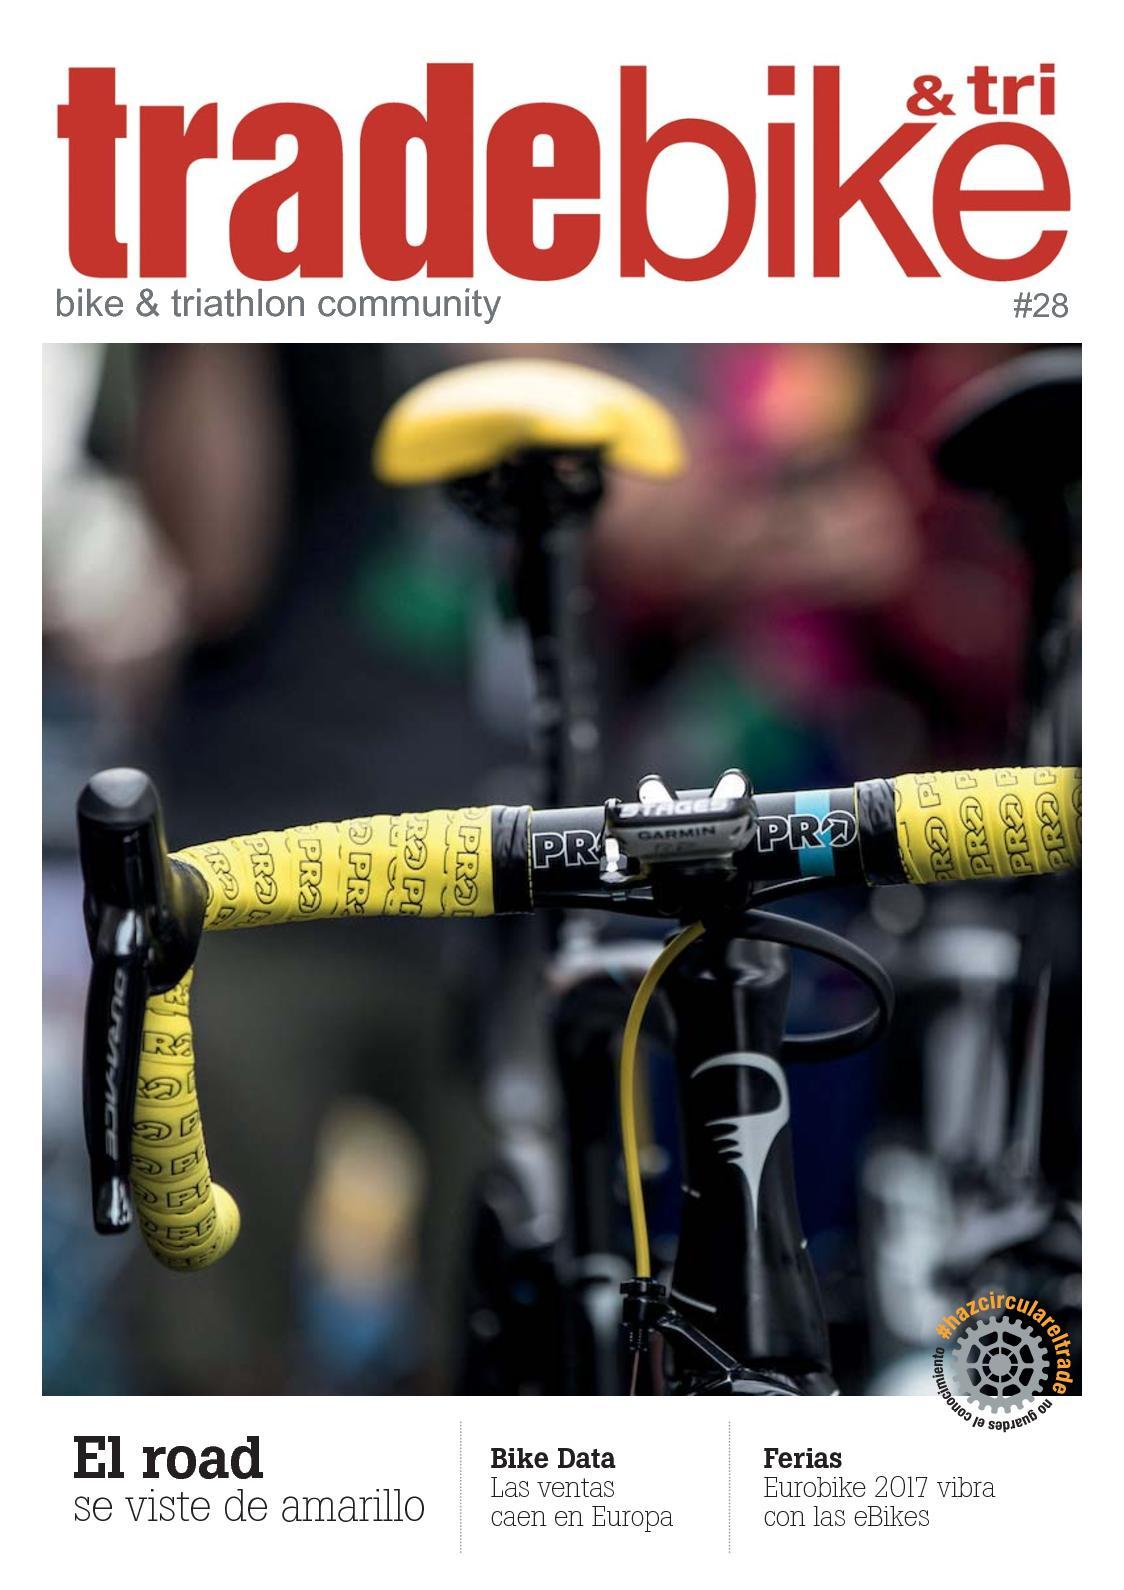 Calaméo - Tradebike&tri 28